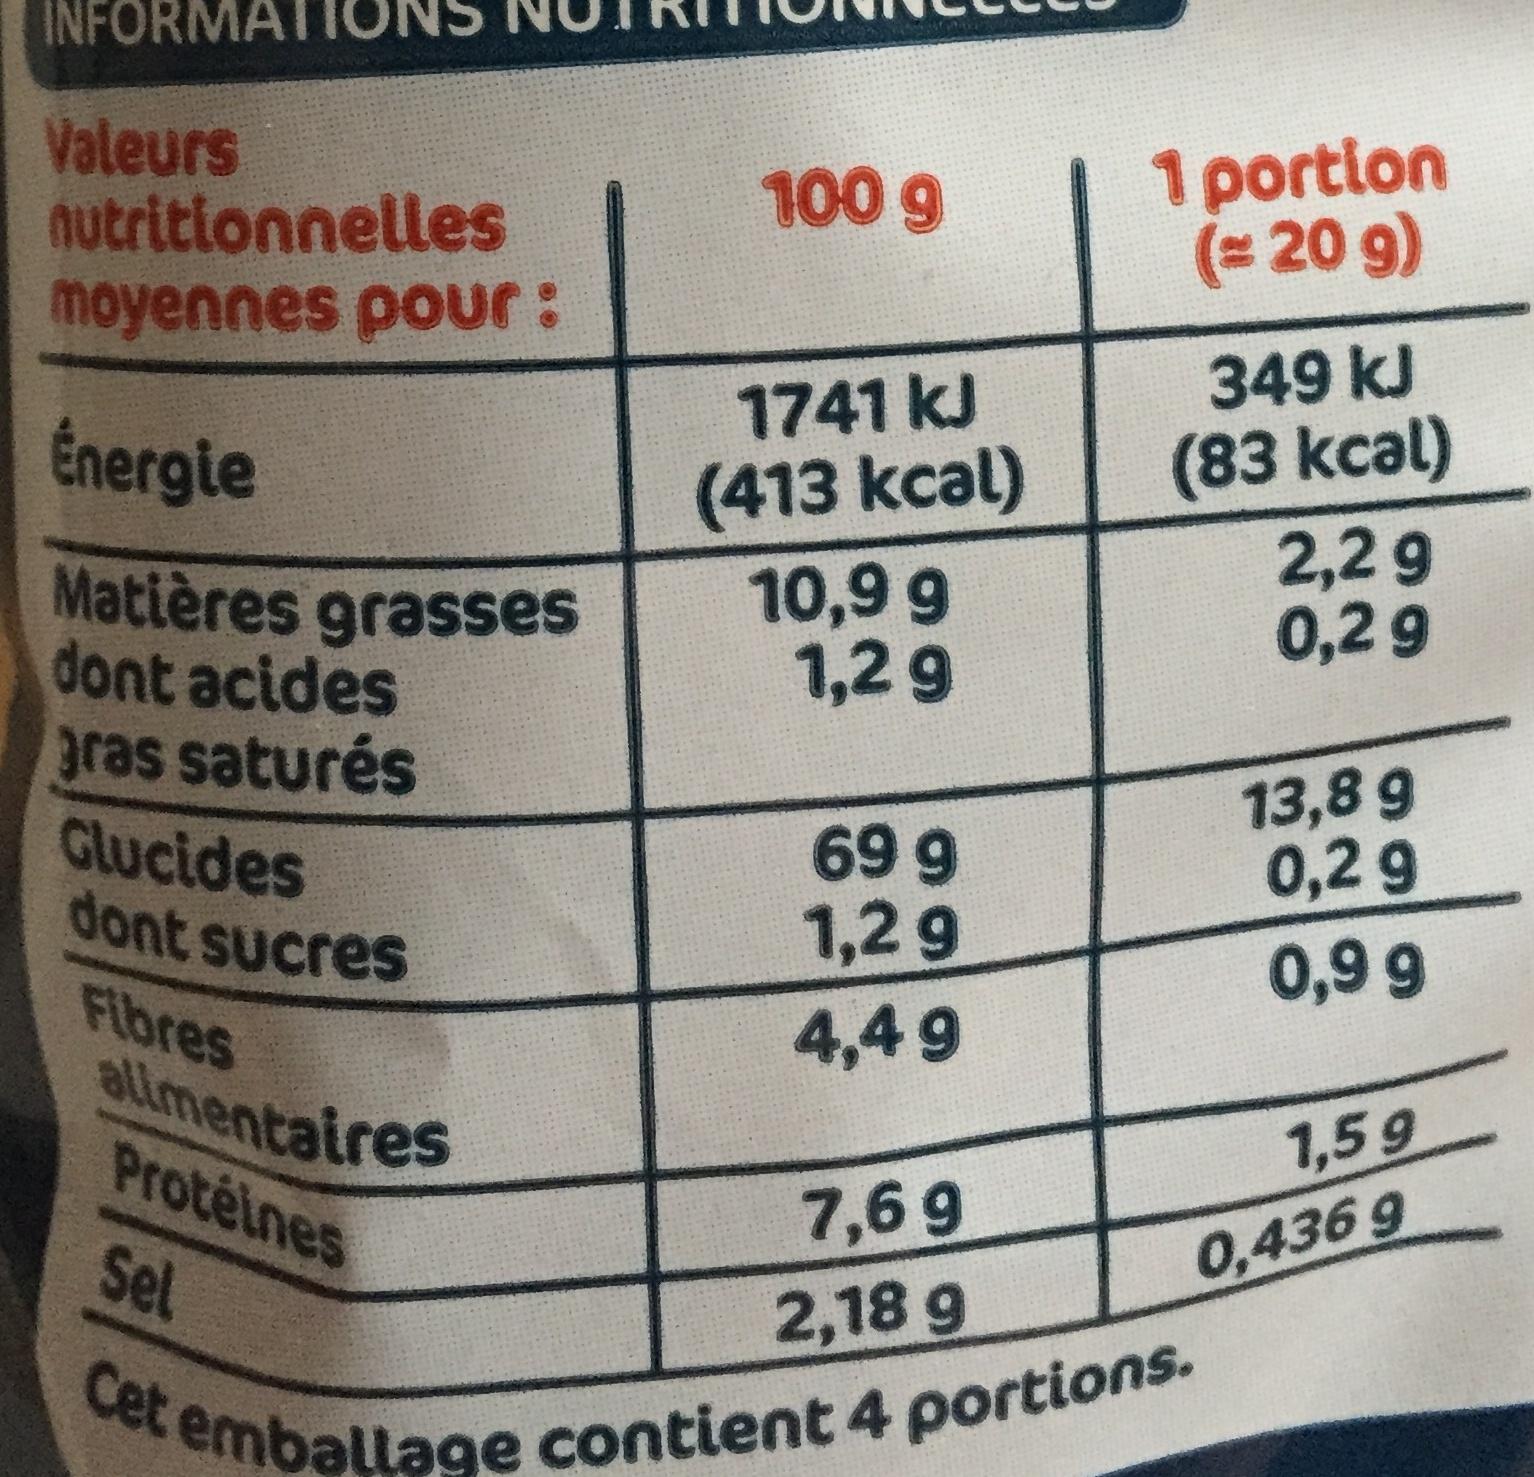 Frites goût salé - Informations nutritionnelles - fr